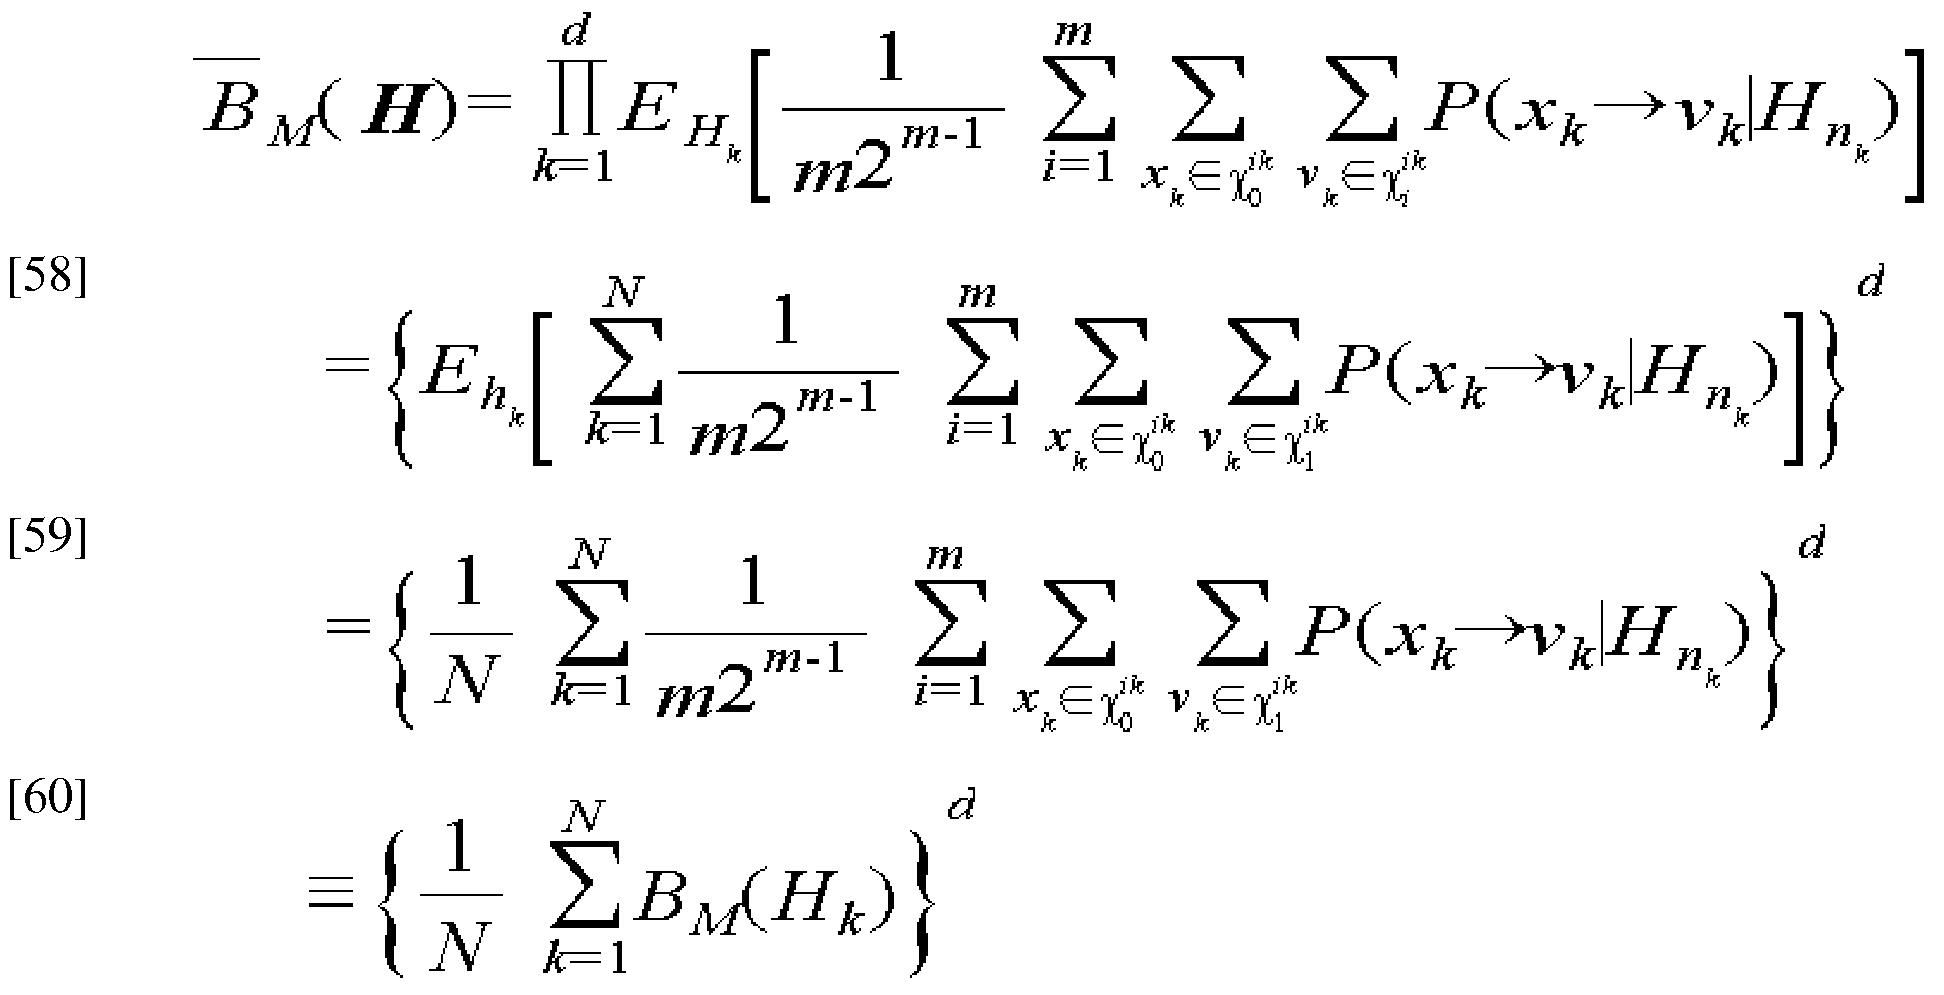 Math probability symbol biocorpaavc